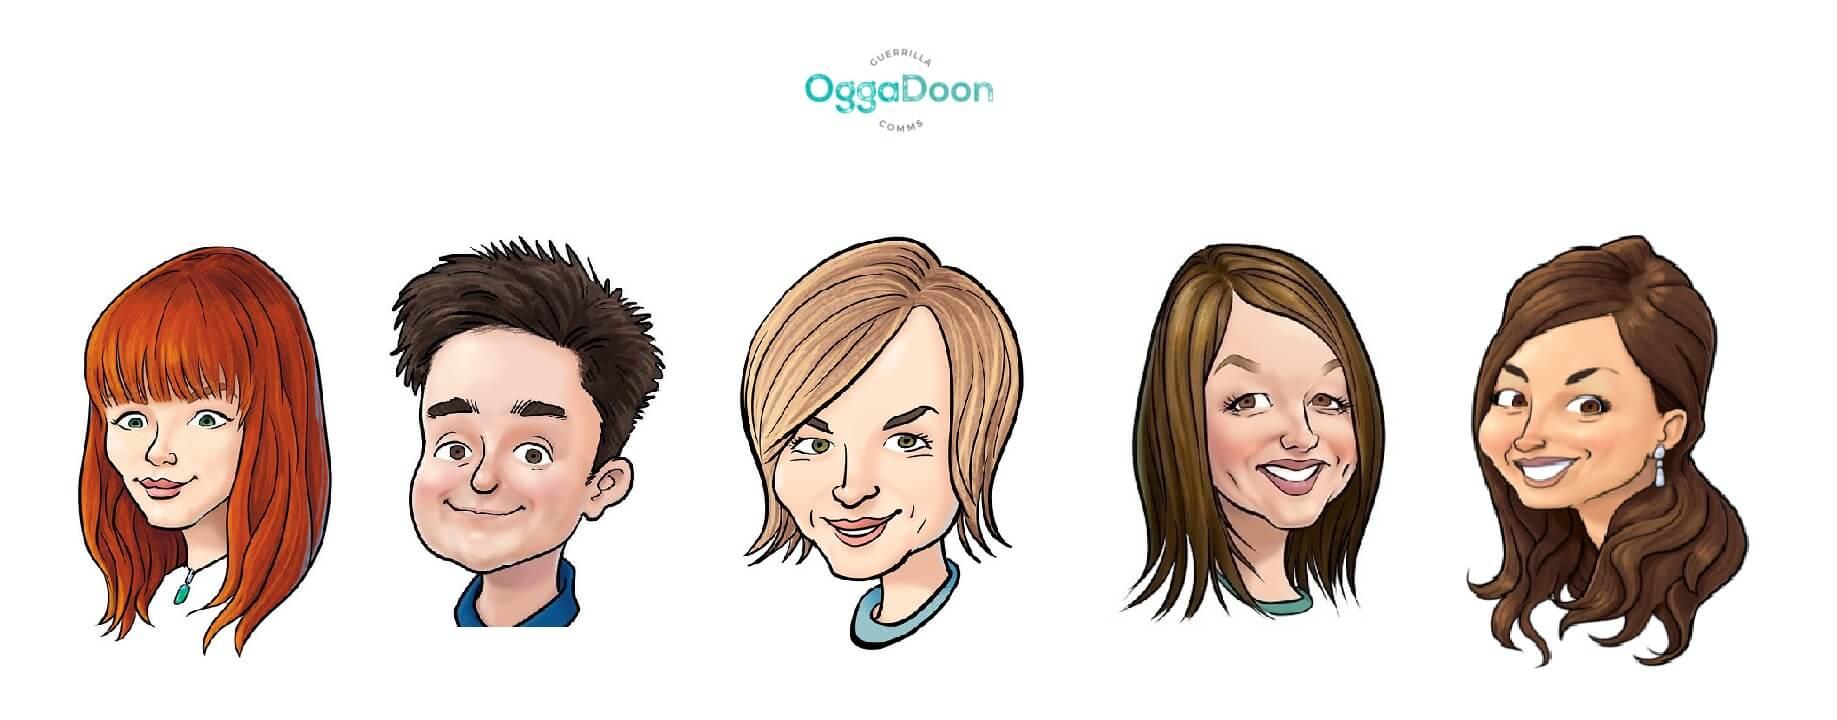 oogadoon-PR-team